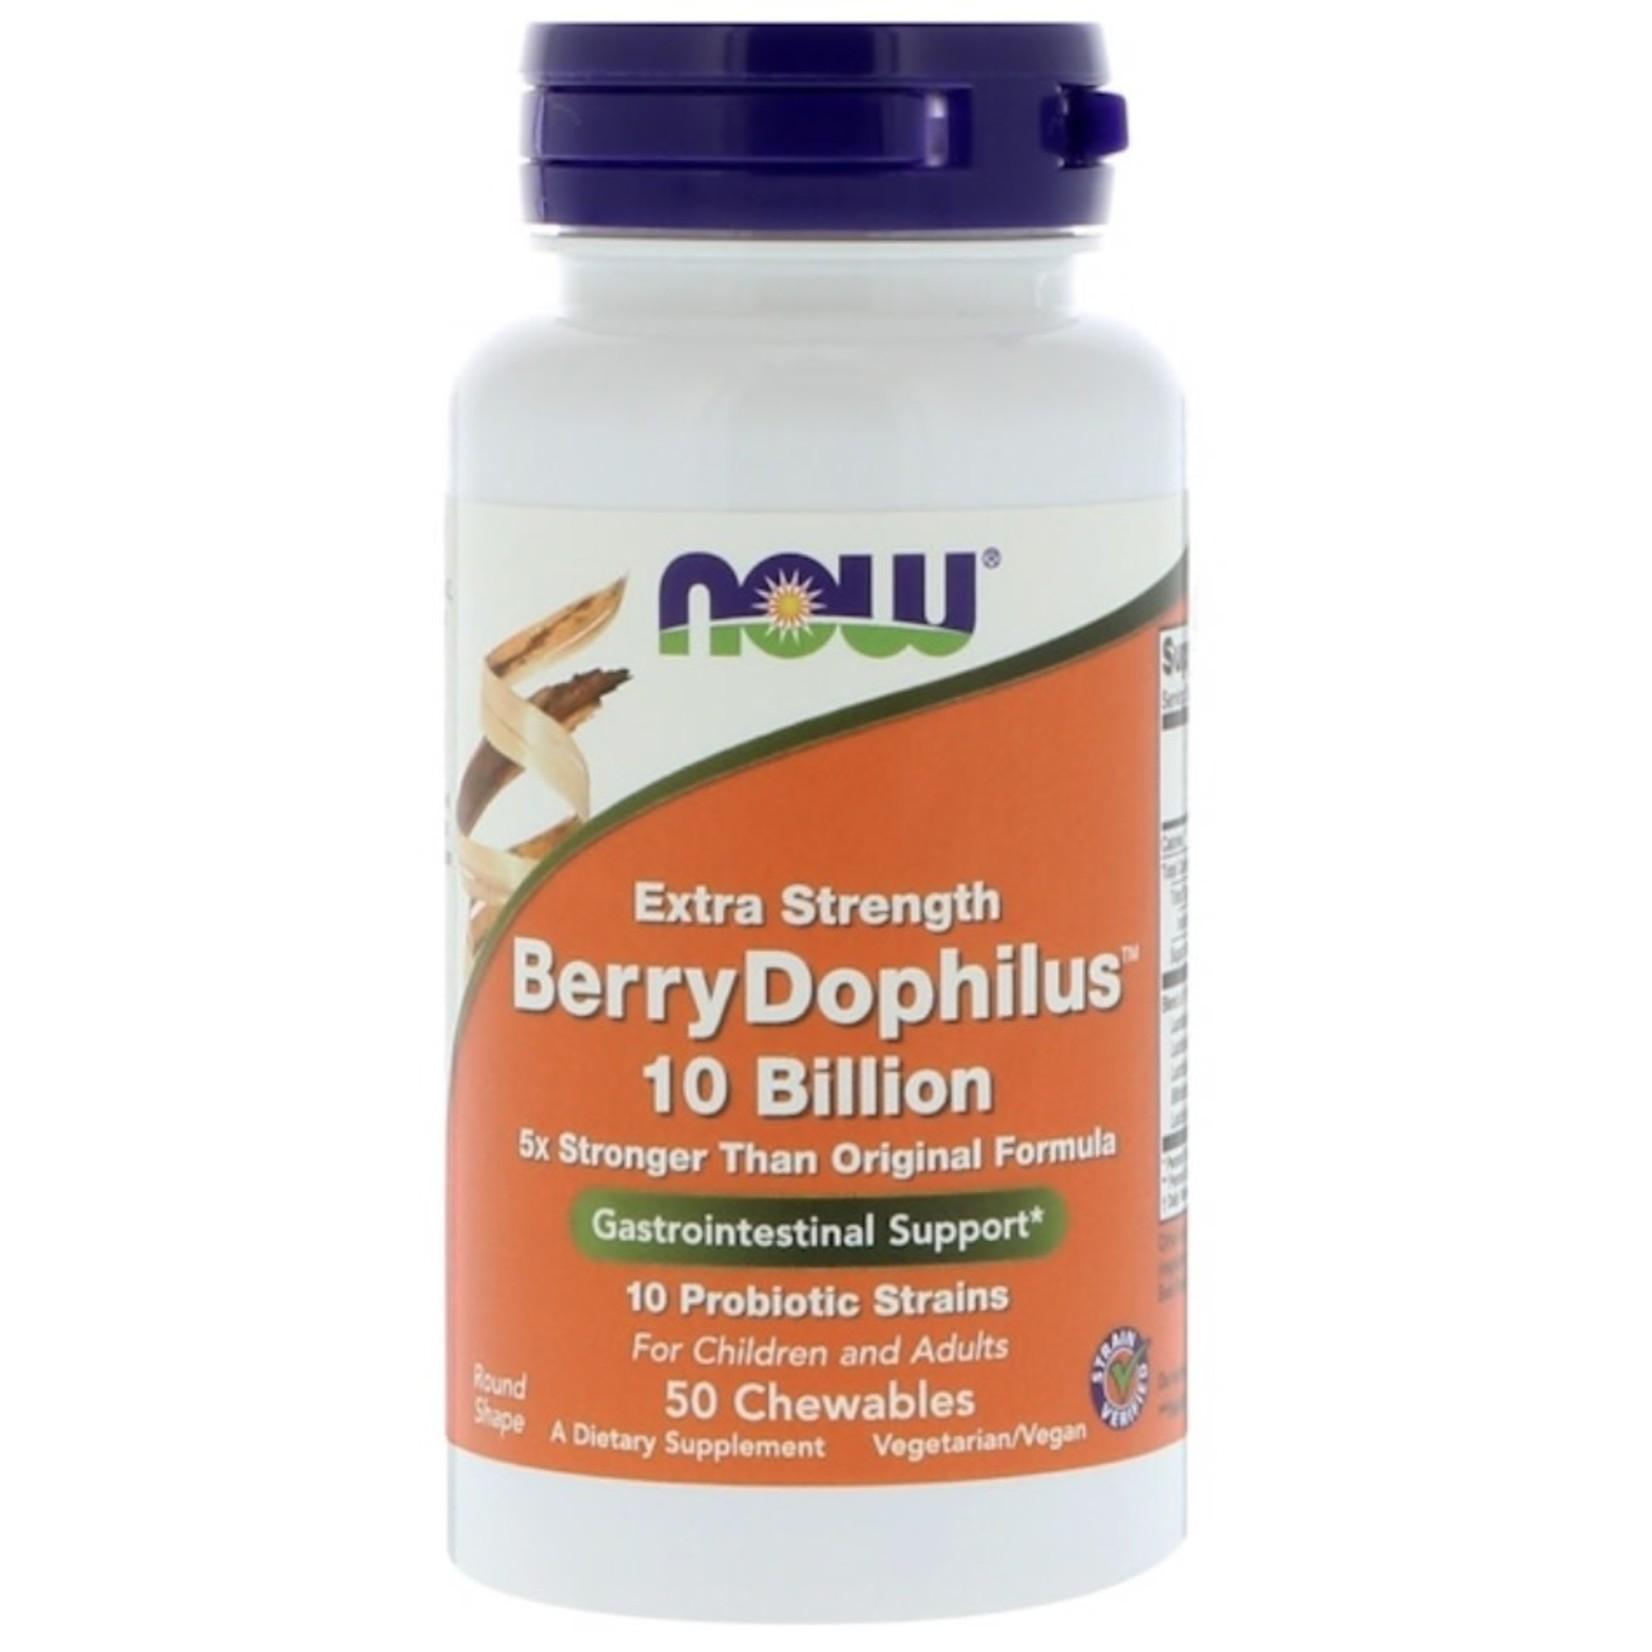 Now Now Extra Strength BerryDophilus